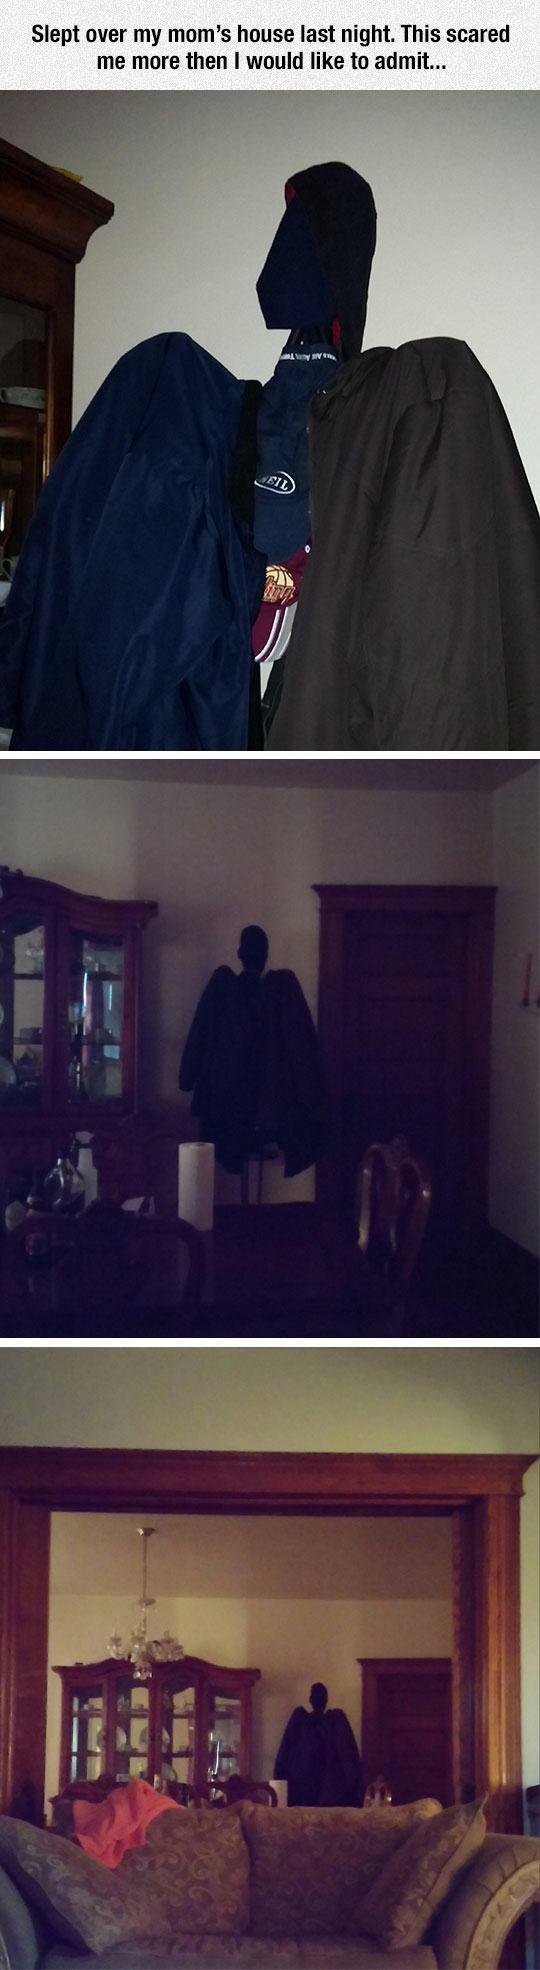 funny-scary-coat-hanger-shadow-1